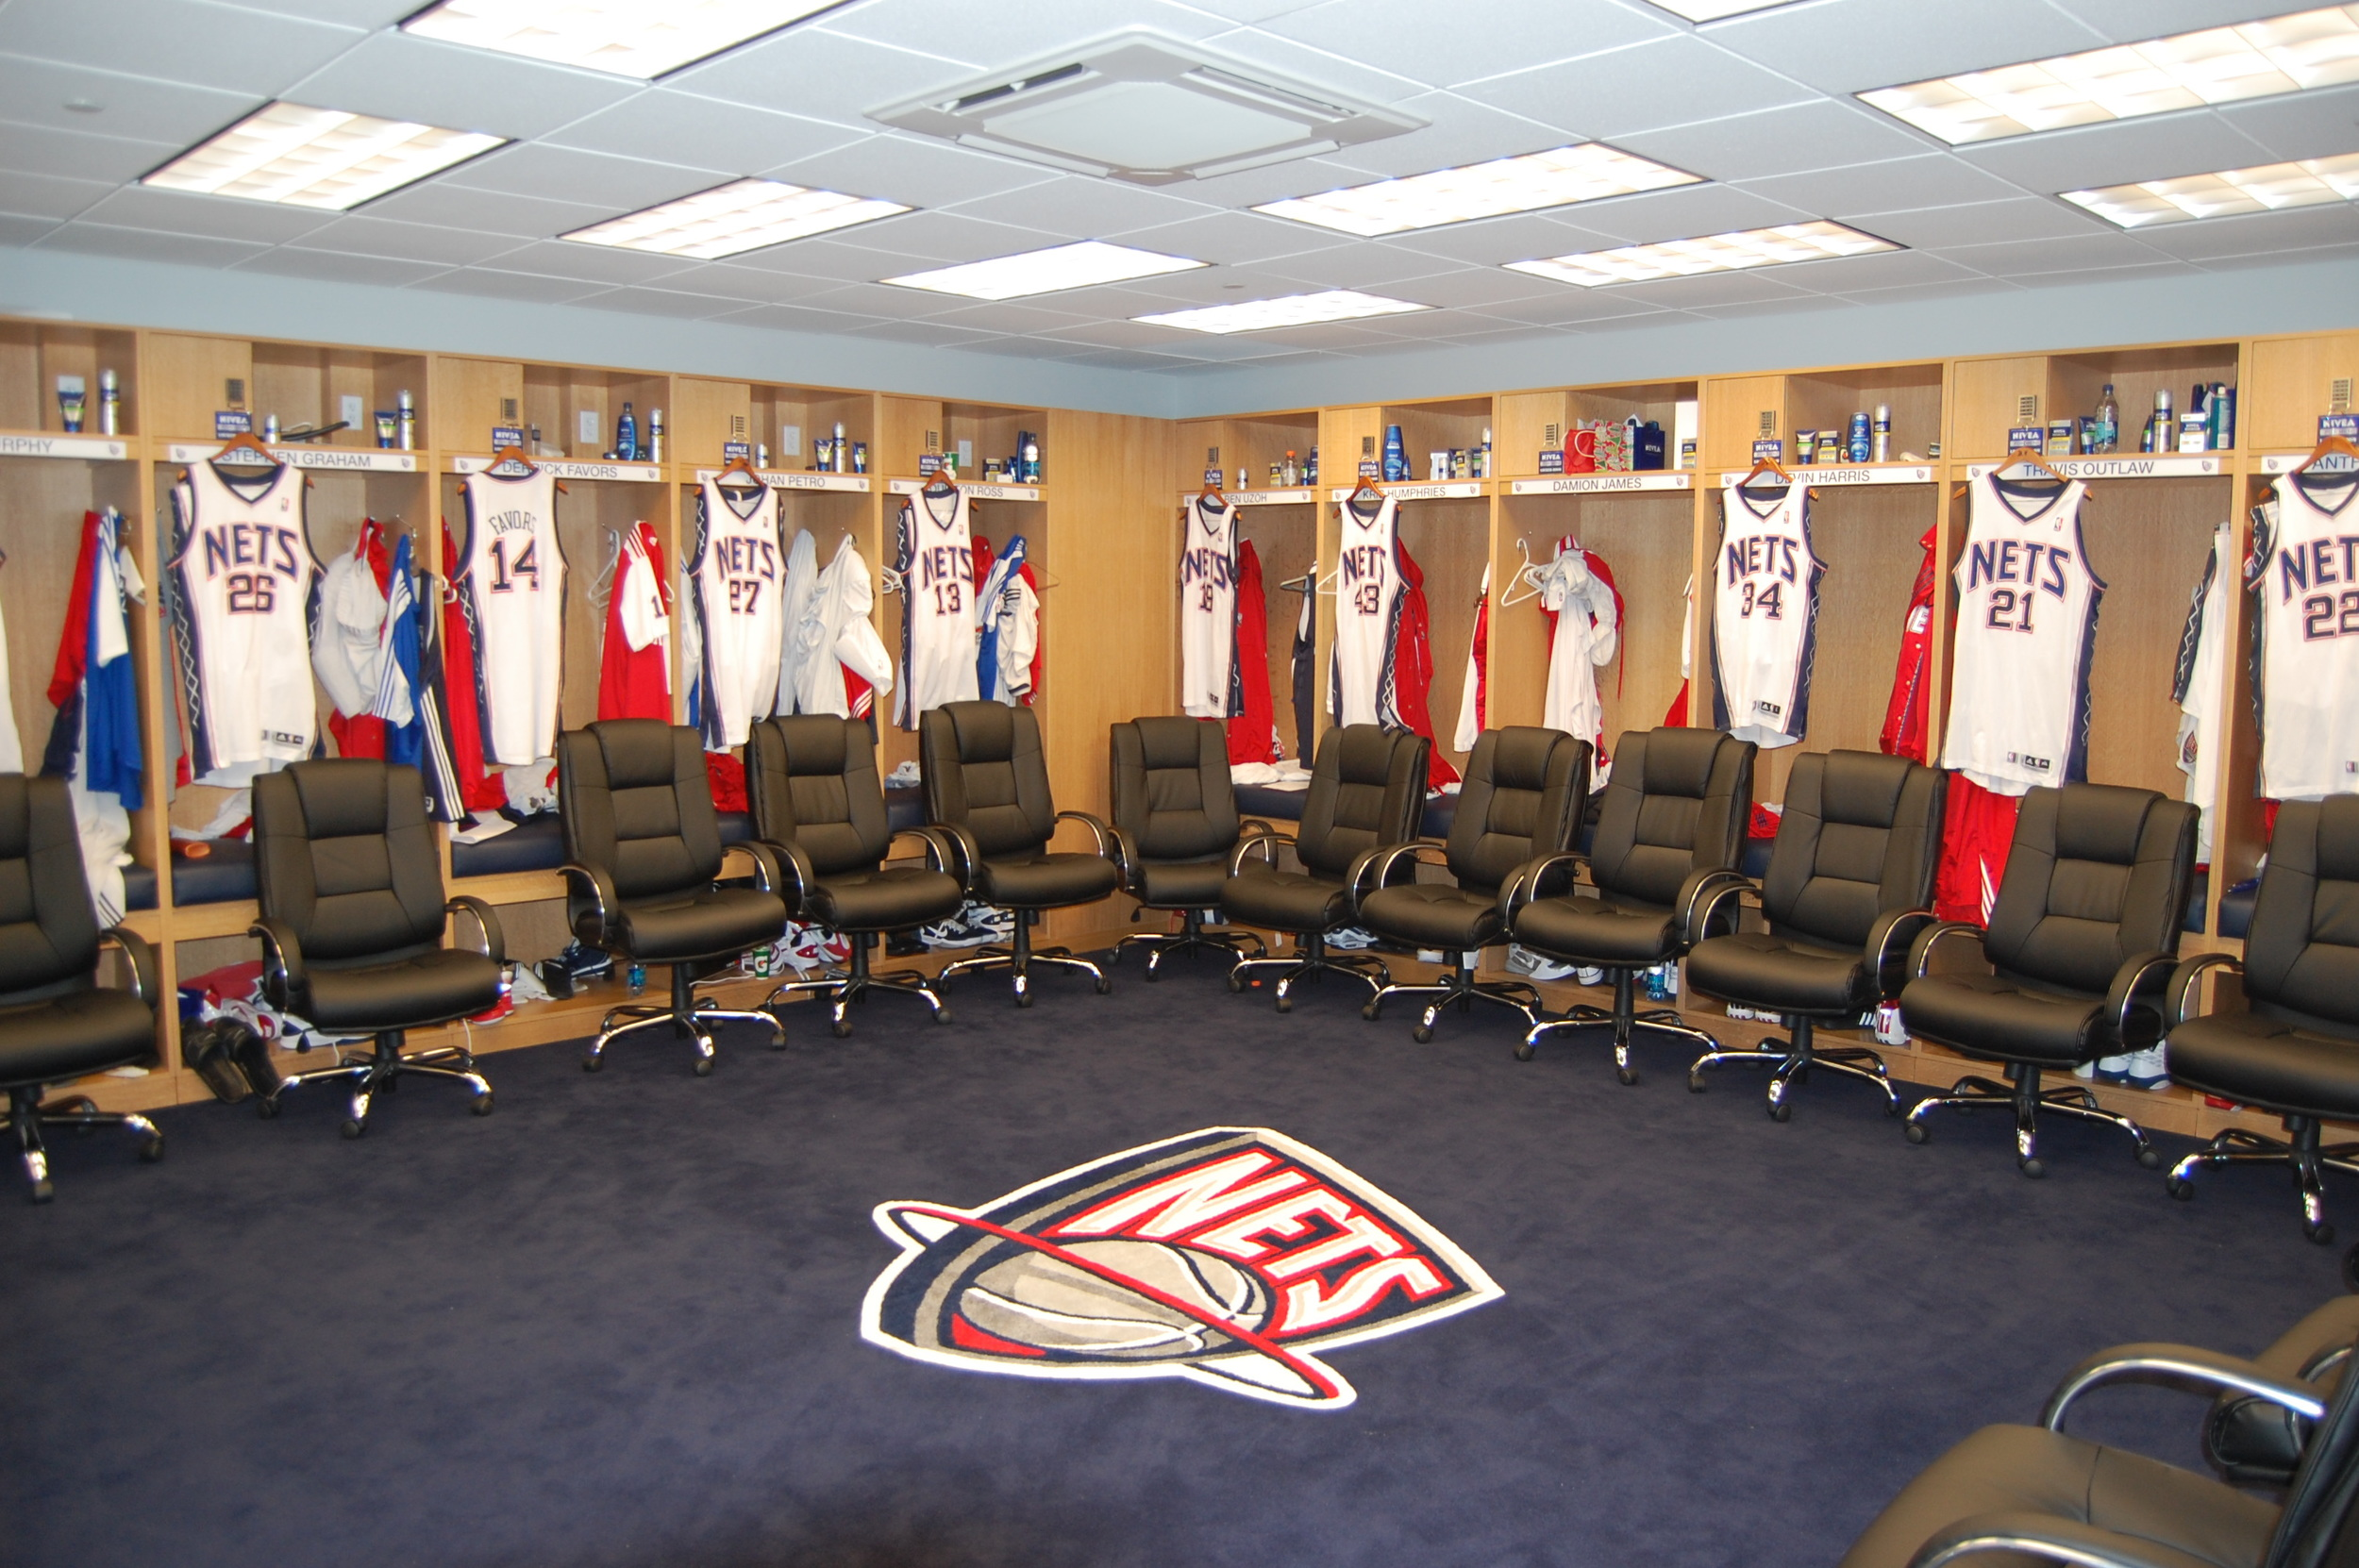 New Jersey Nets Locker Room